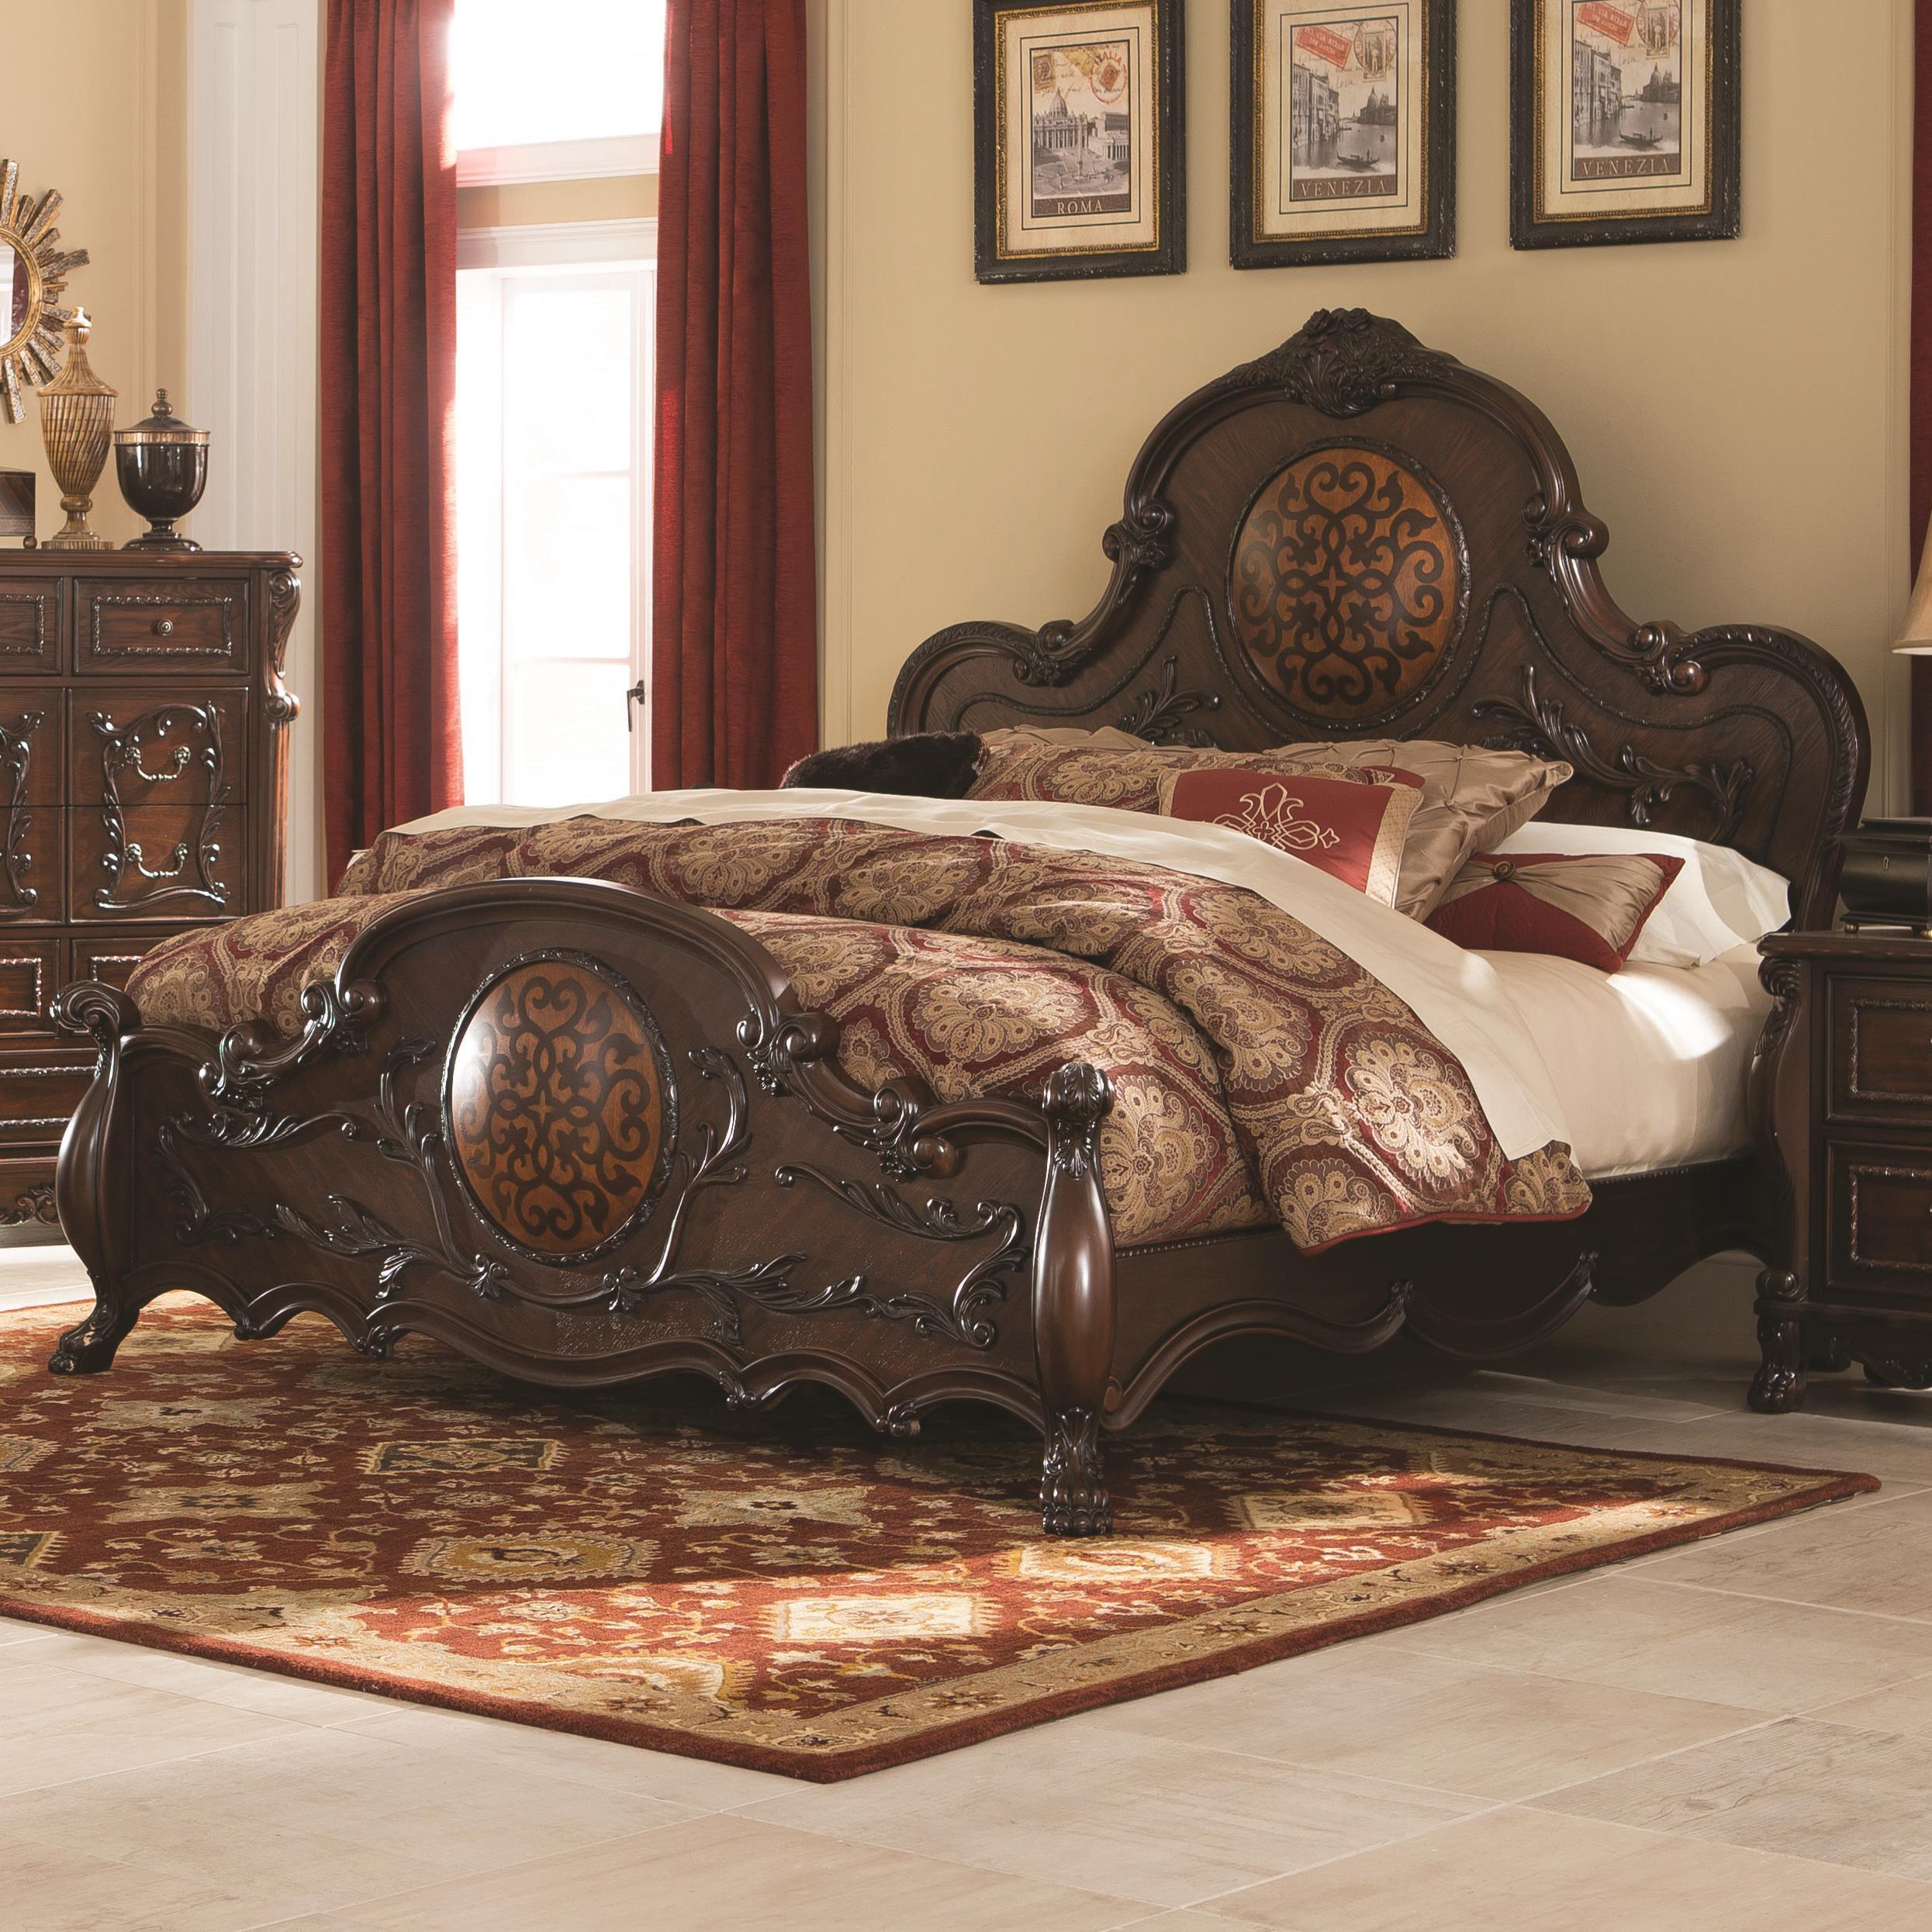 Coaster Abigail Queen Bed - Item Number: 204450Q